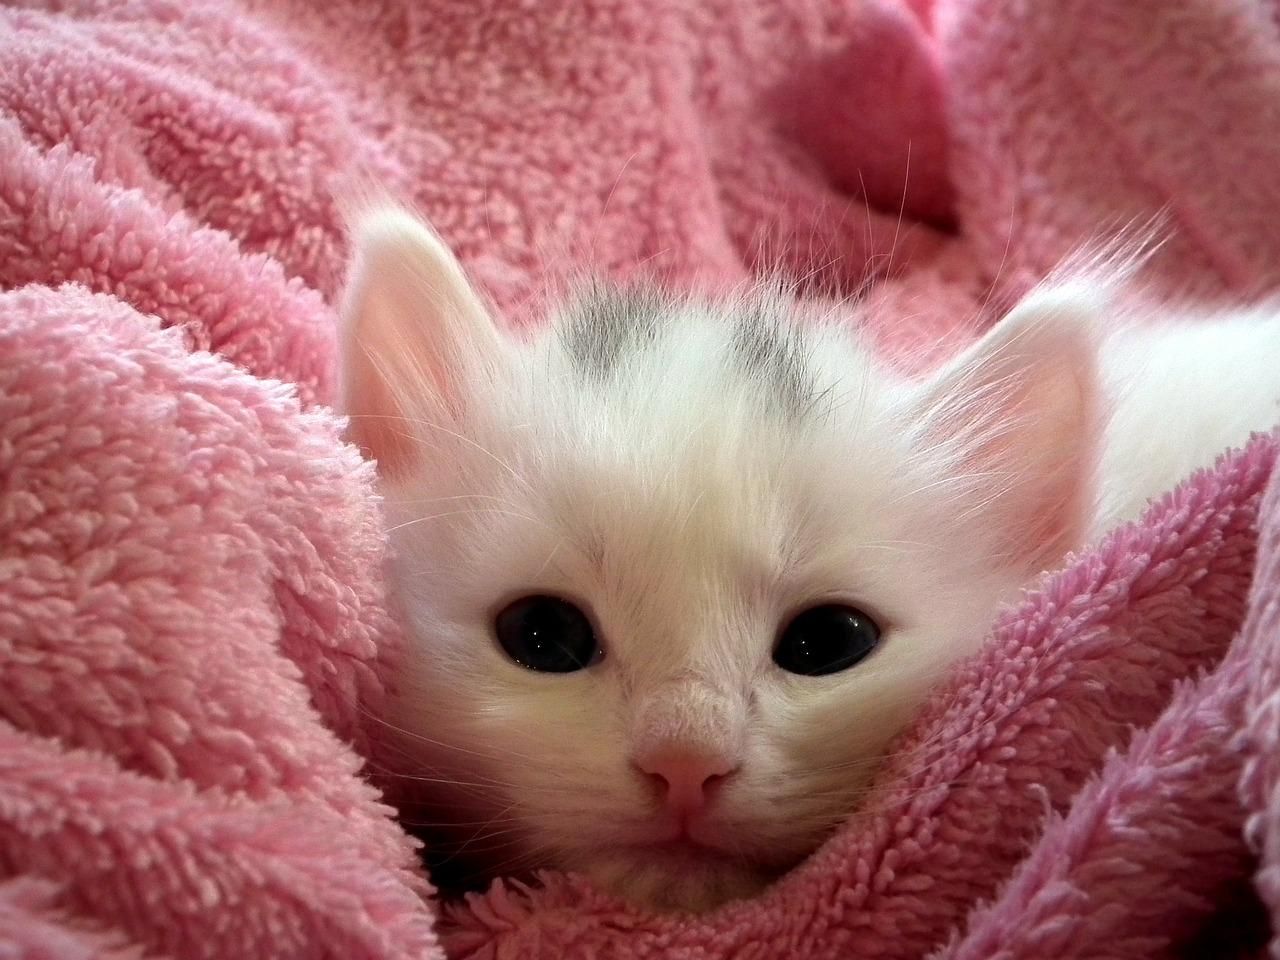 domestic kitten on a pink towel